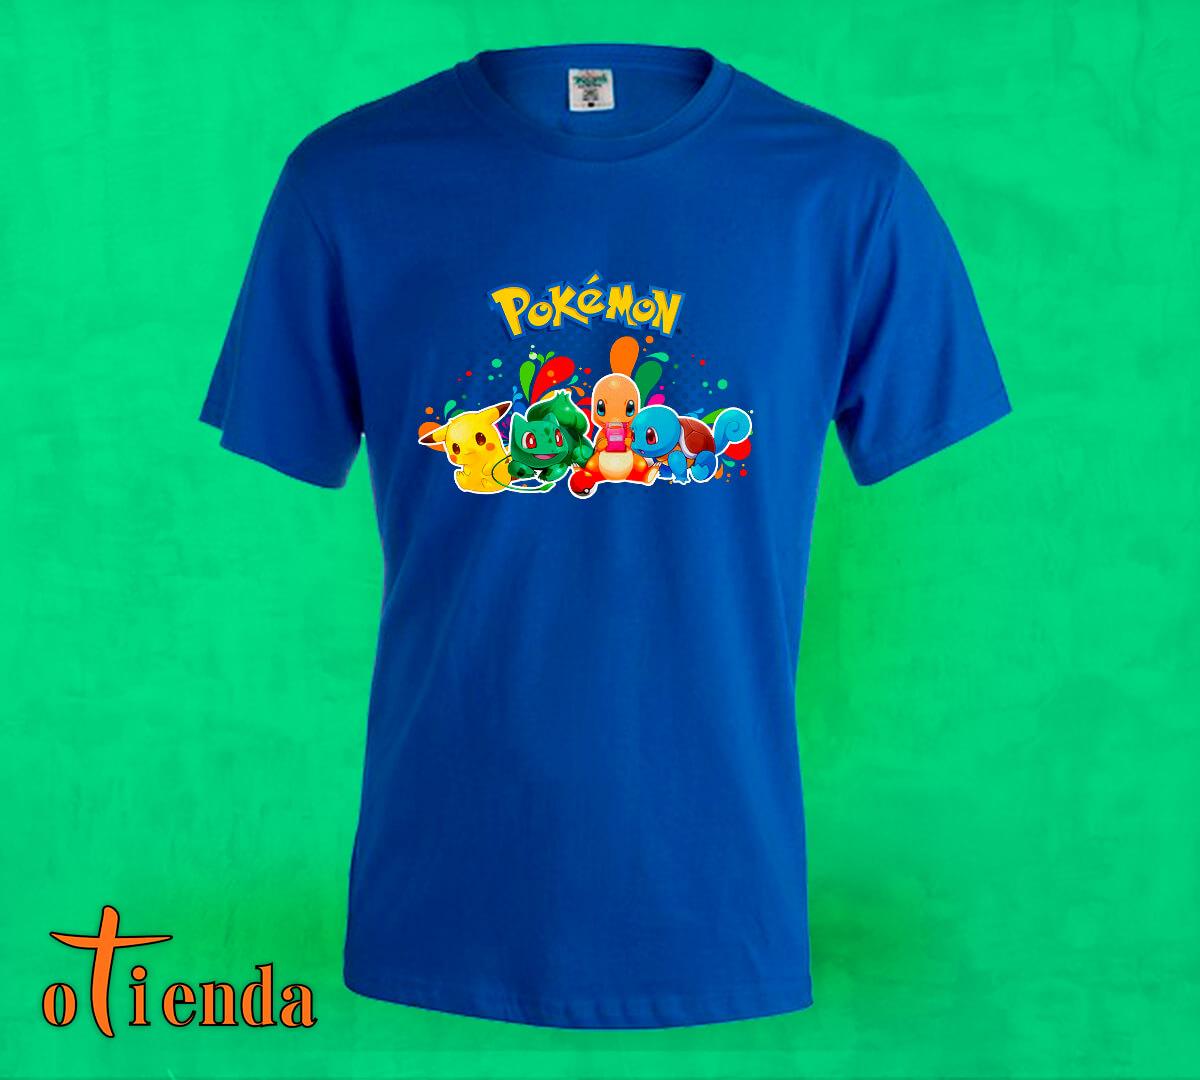 Camiseta de color Pokémon personalizada